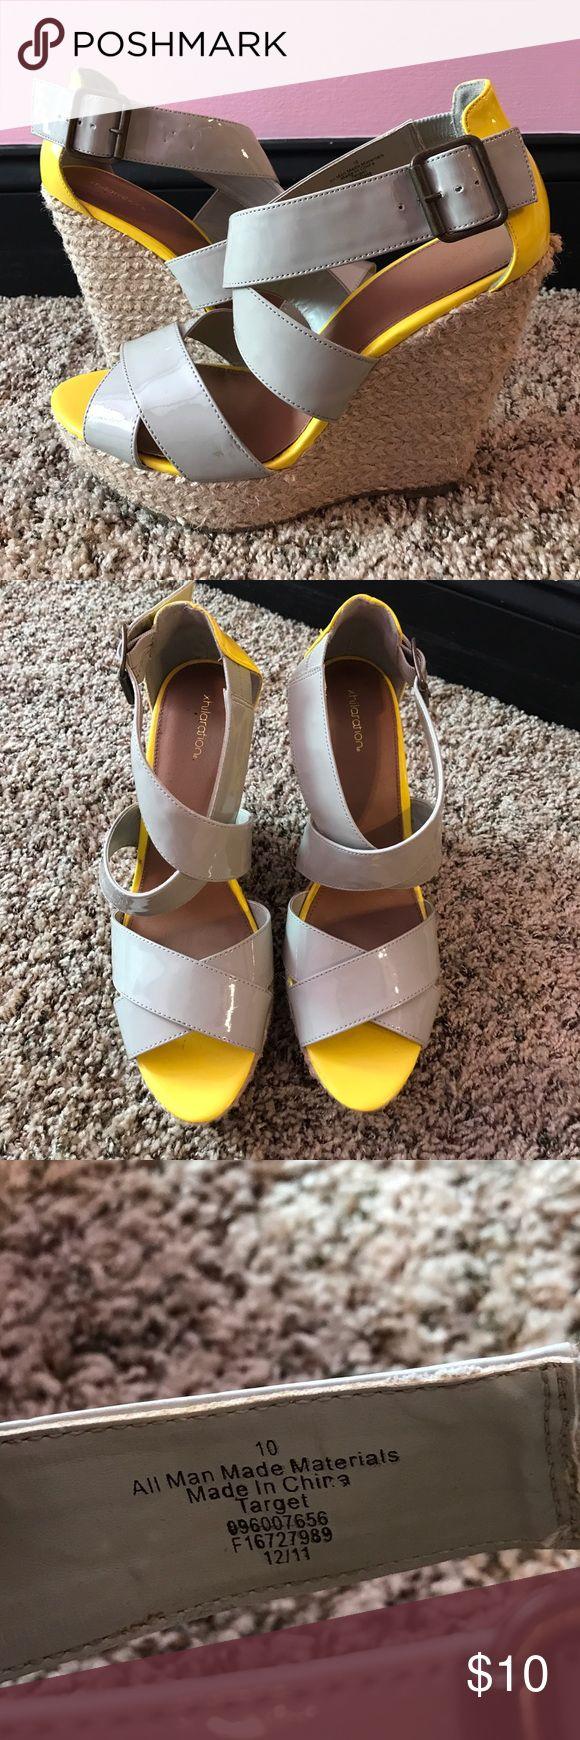 Grey and yellow wedges sz10 Grey and yellow wedge with straw wedge heel! Xhilaration Shoes Wedges